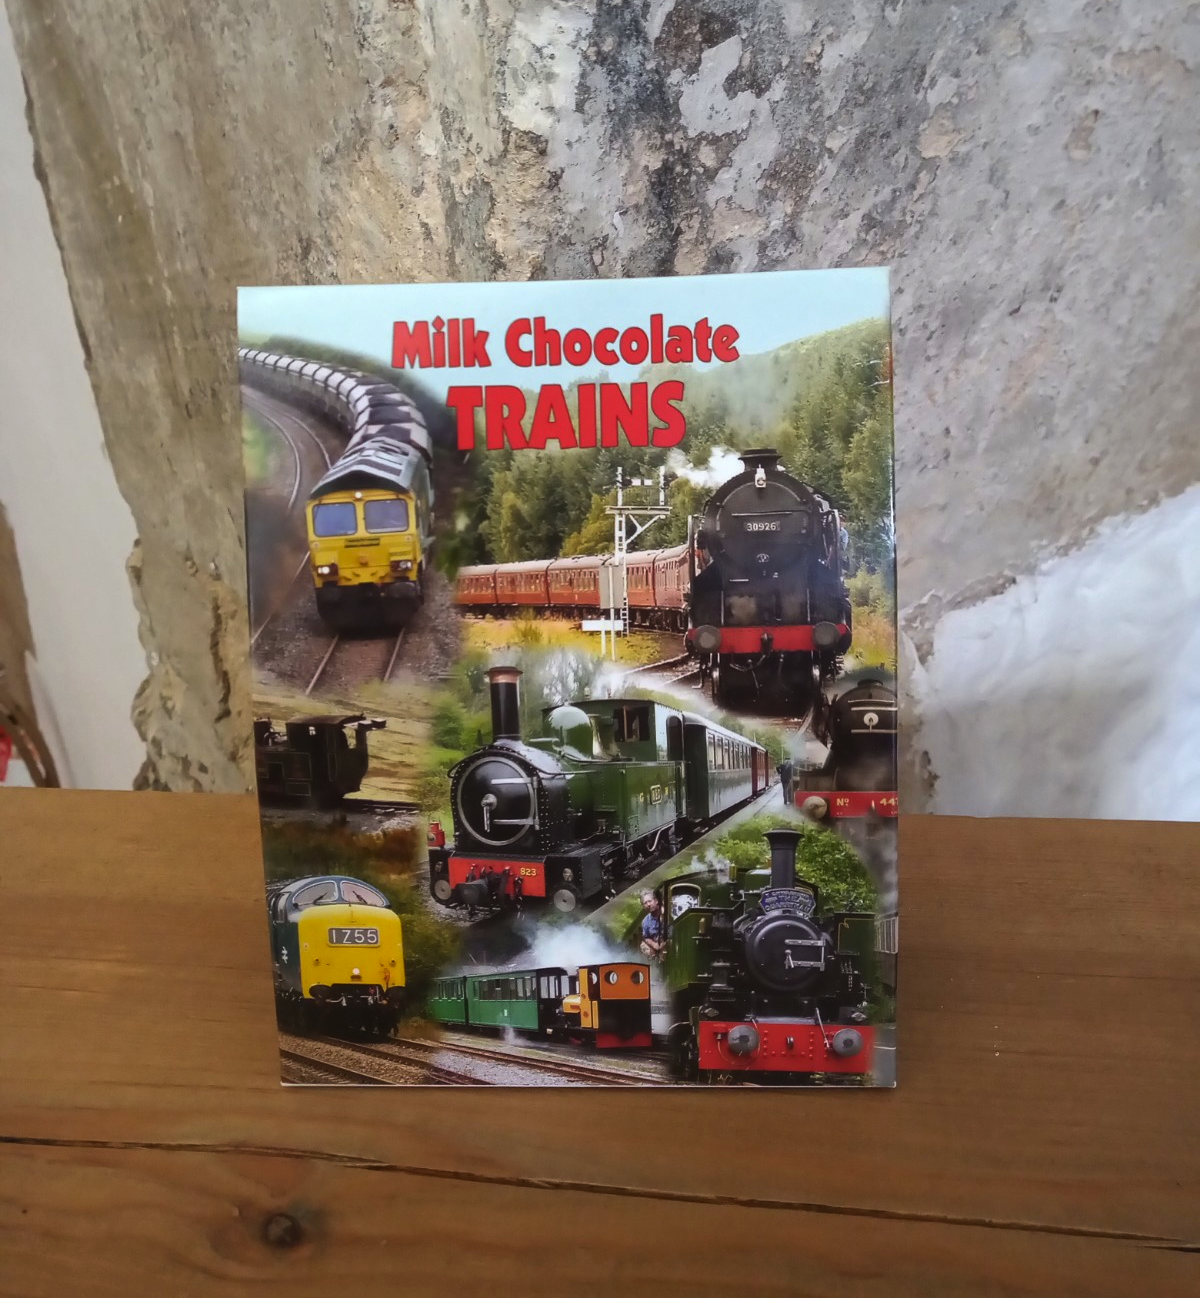 Milk Chocolate Trains